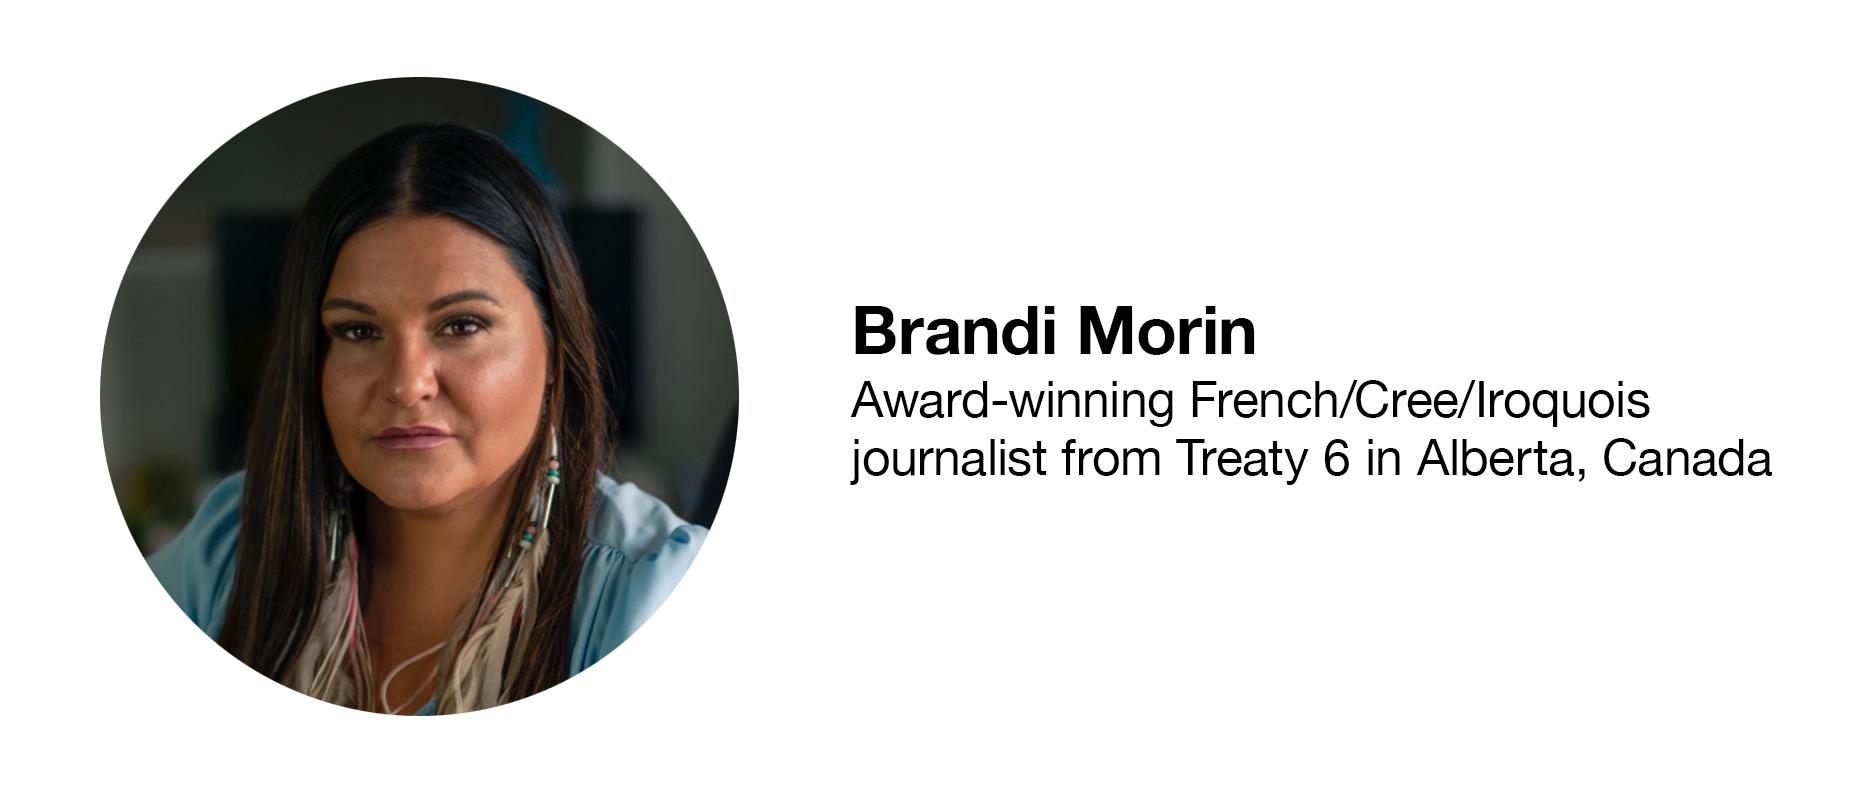 Brandi Morin Award-winning French/Cree/Iroquois journalist from Treaty 6 in Alberta, Canada